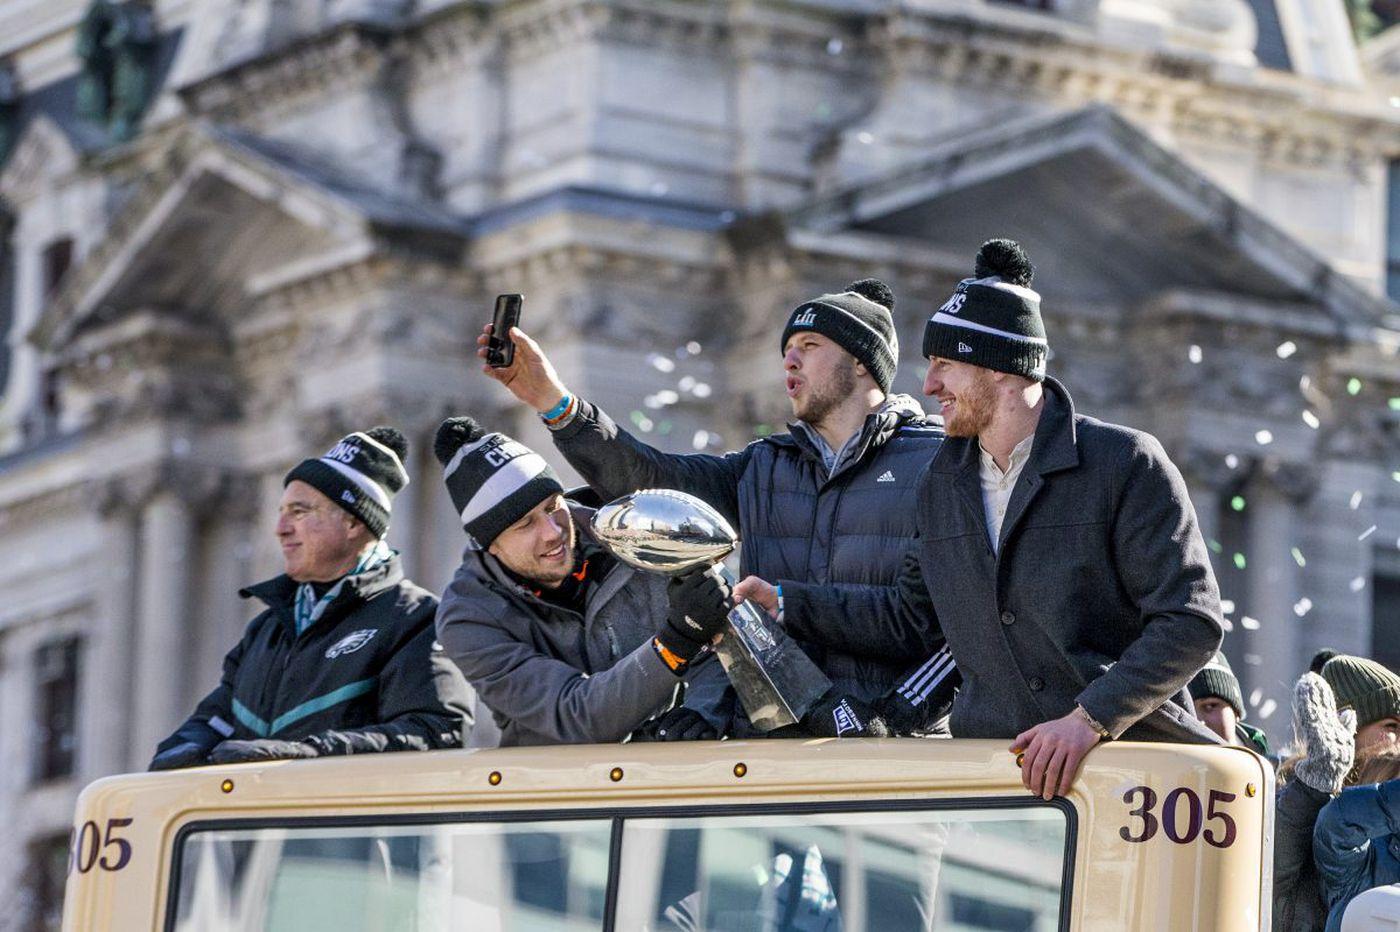 Eagles parade: Recapping Philadelphia's Super Bowl celebration